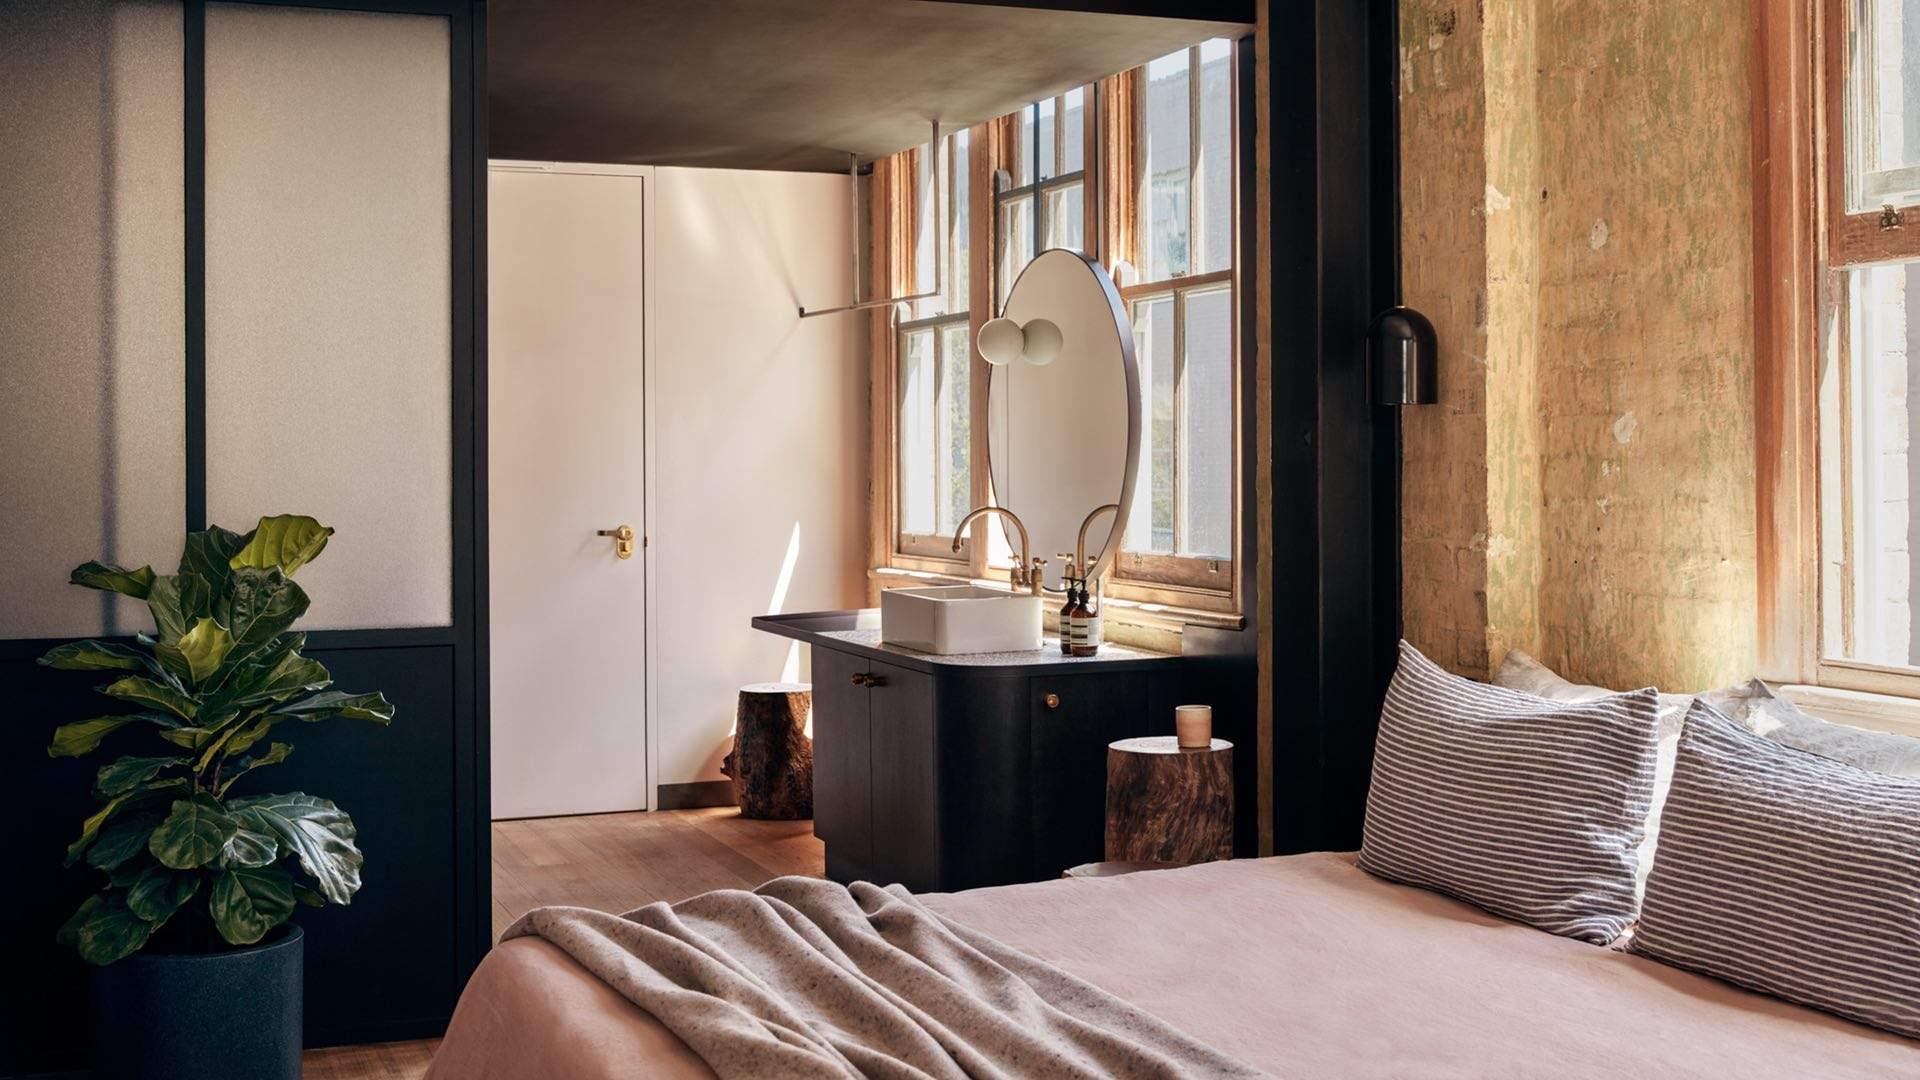 The Ten Most Impressive Designer Hotels to Open in Australia in 2018